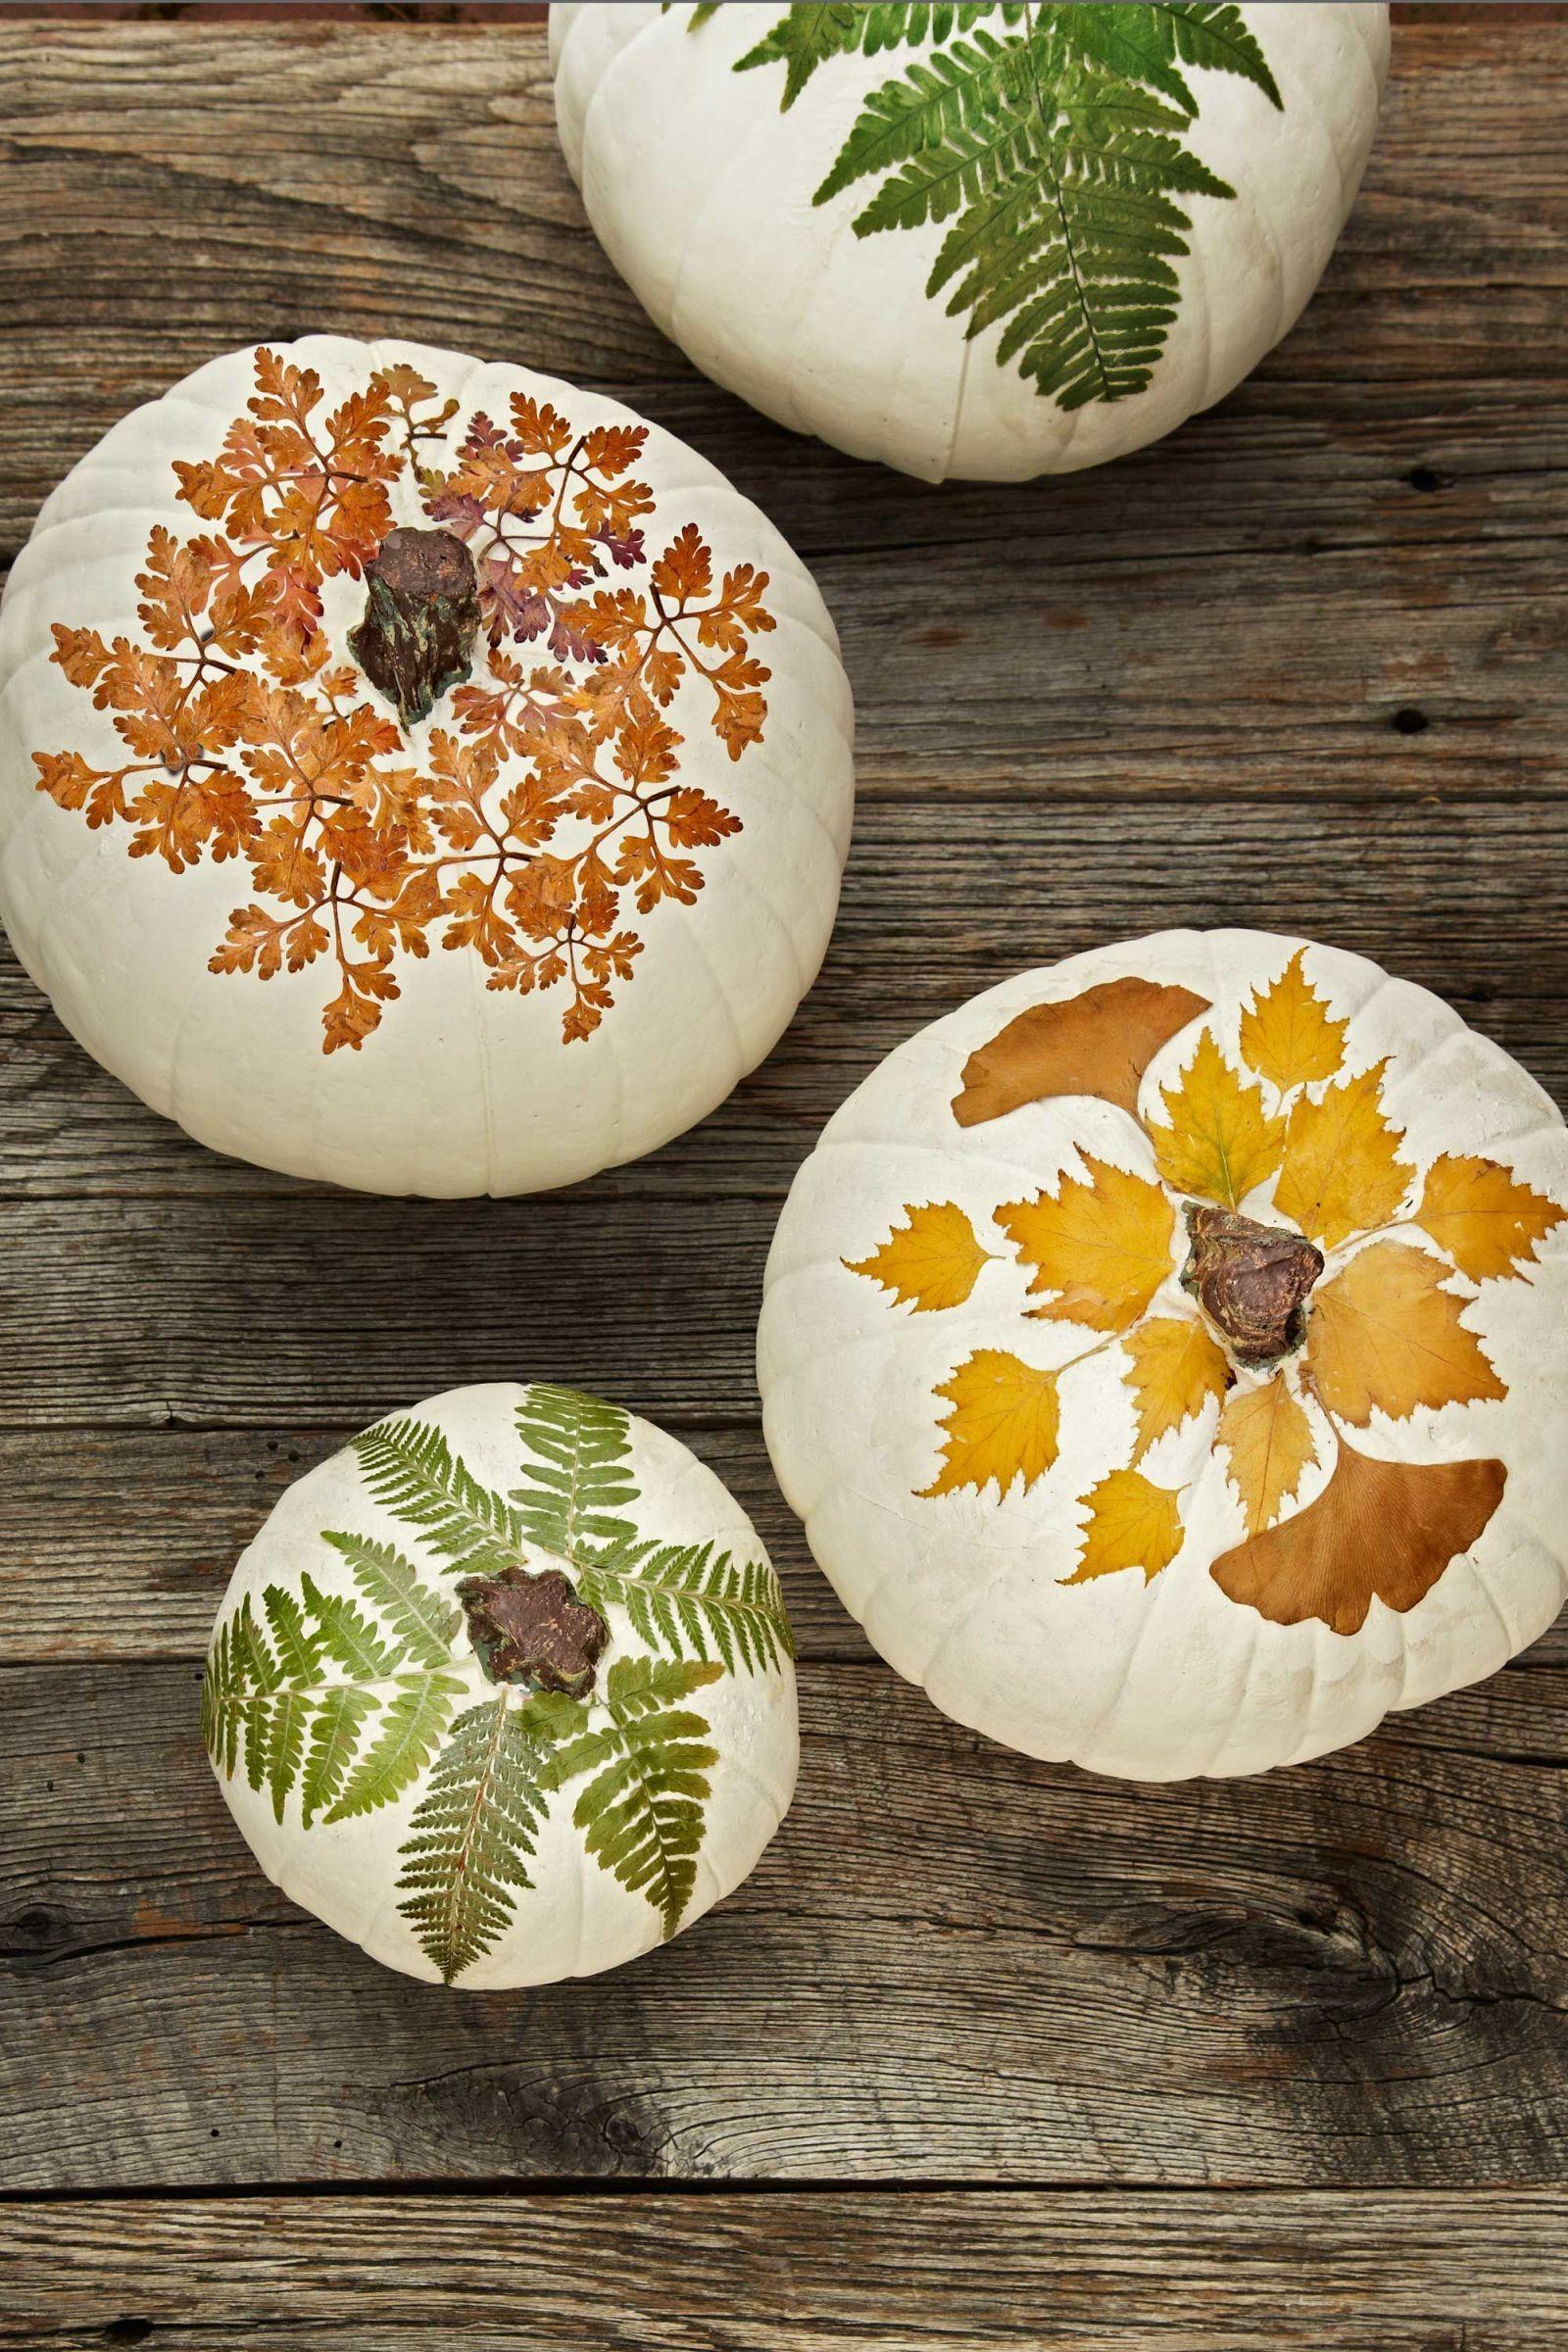 creative ideas for nocarve pumpkins pumpkin ideas autumn and